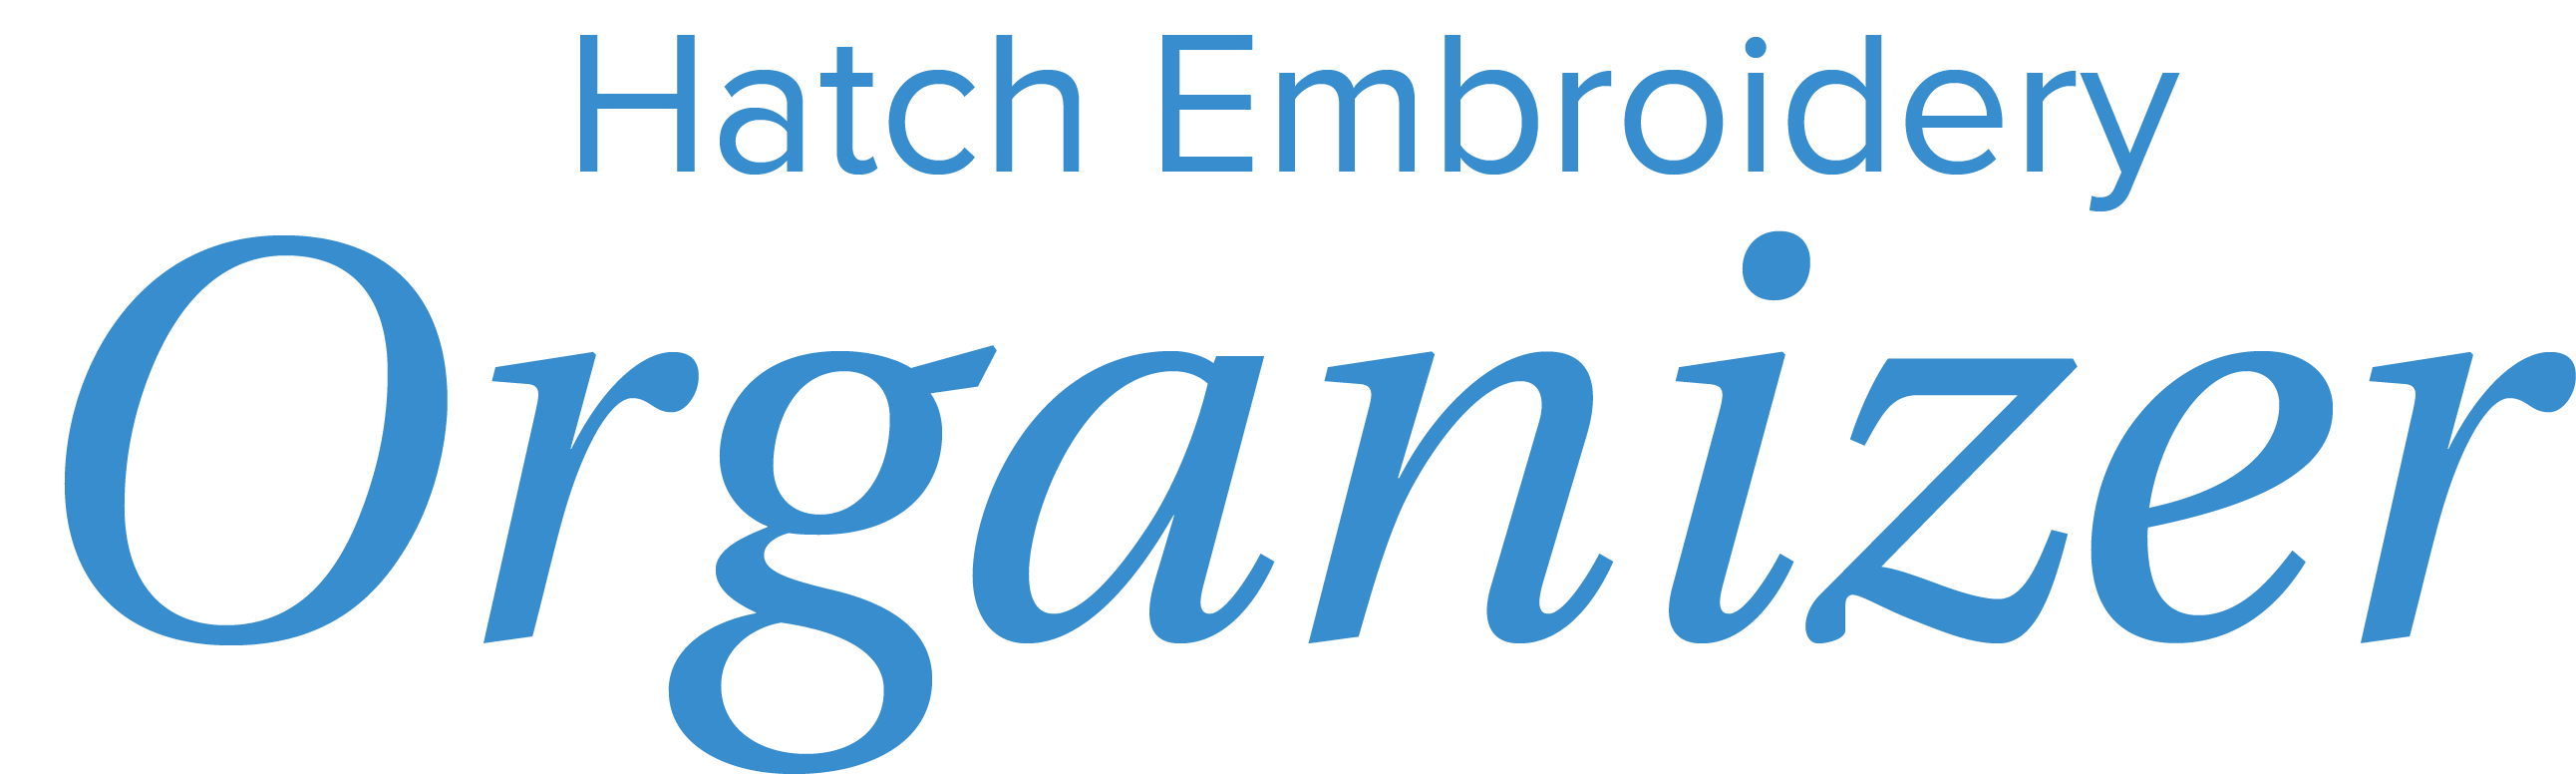 hatch embroidery organizer